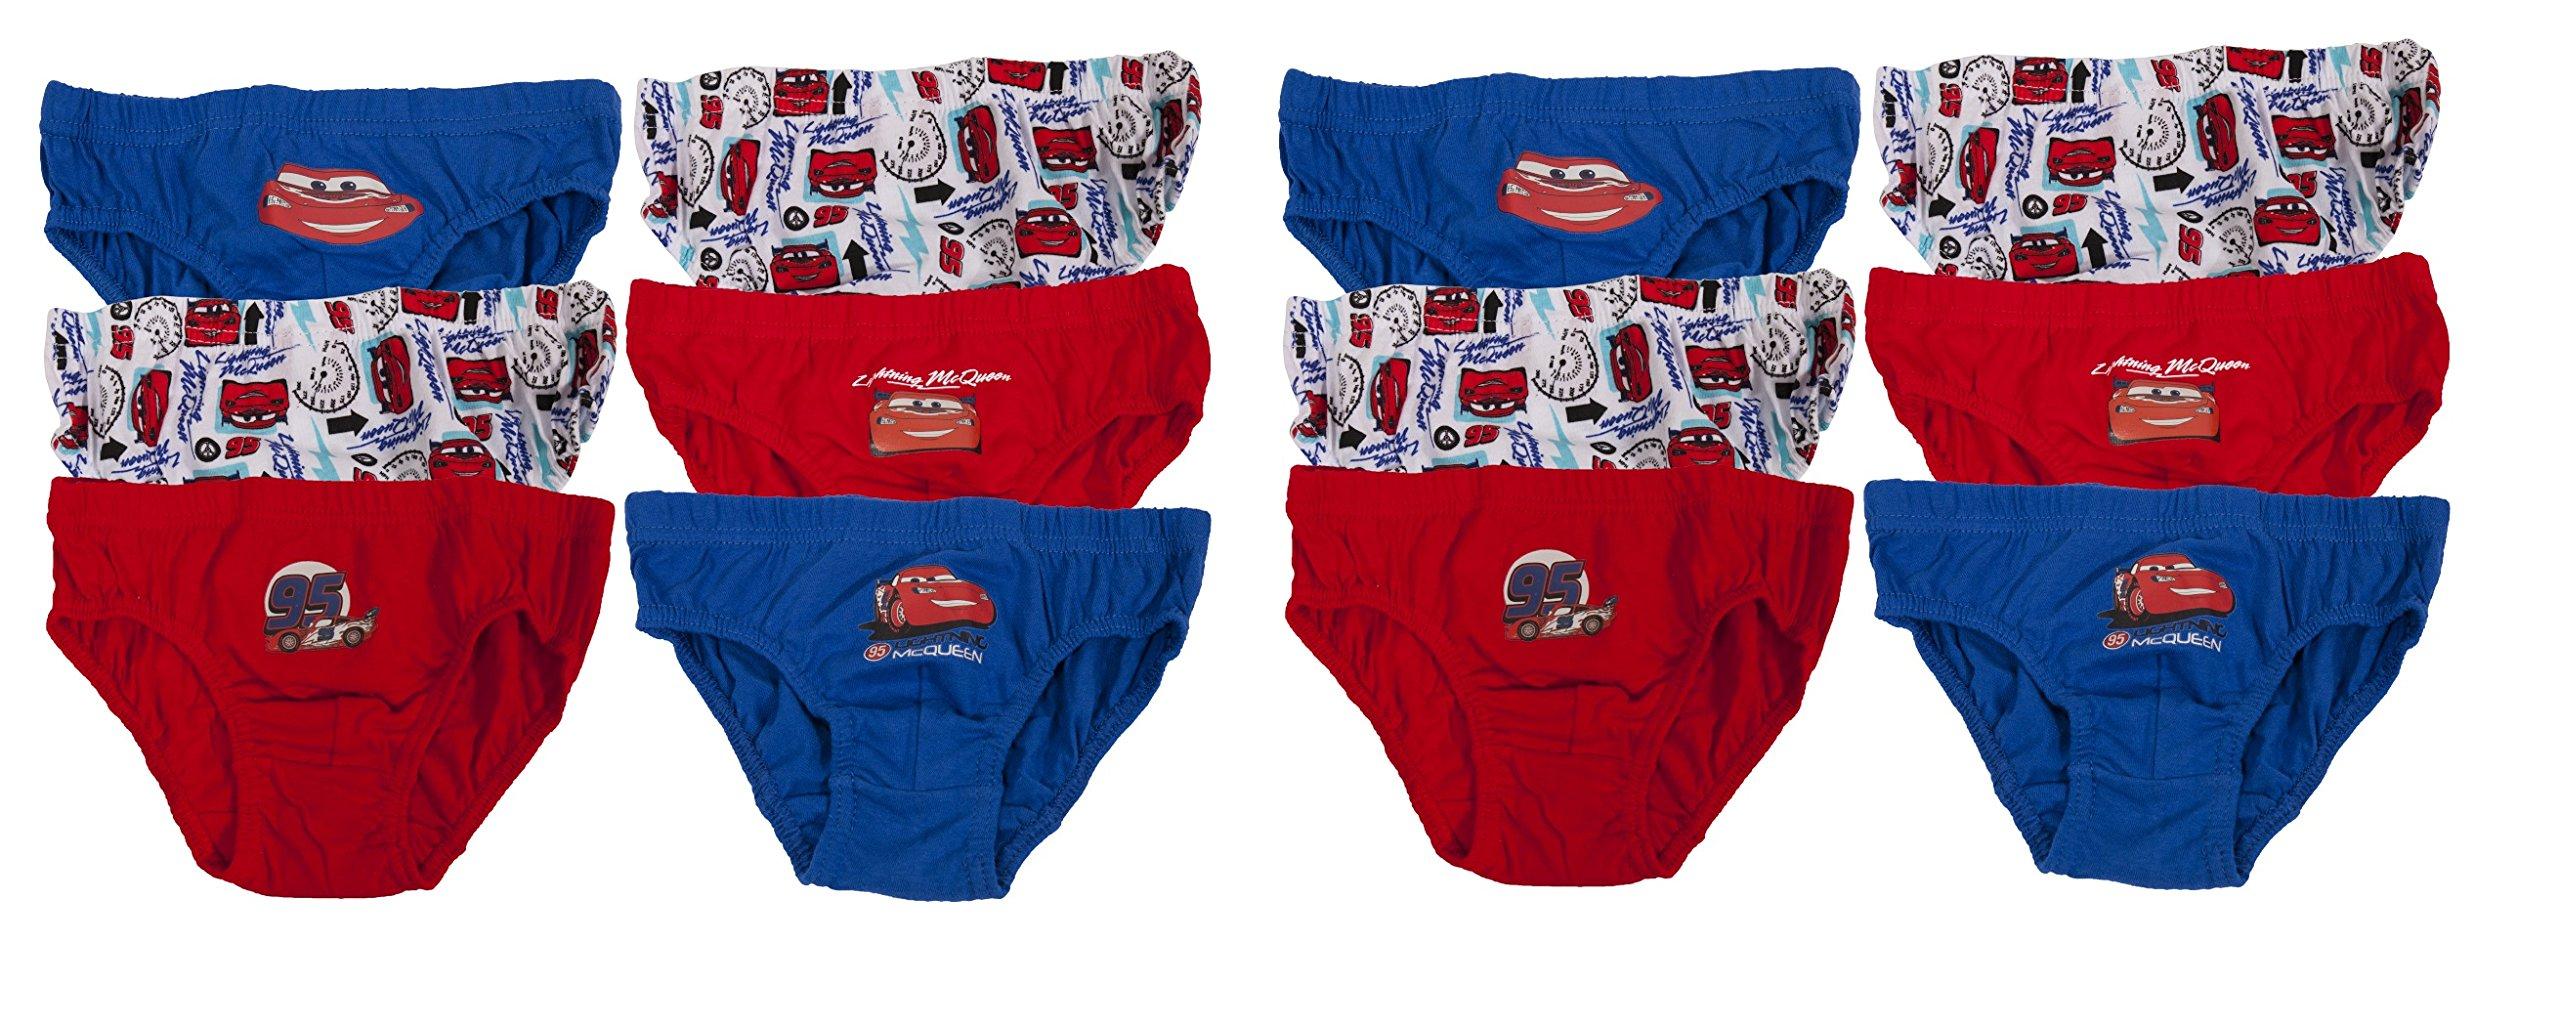 Boys Disney Cars Boxers Boxer Shorts Pants Underwear Trunks